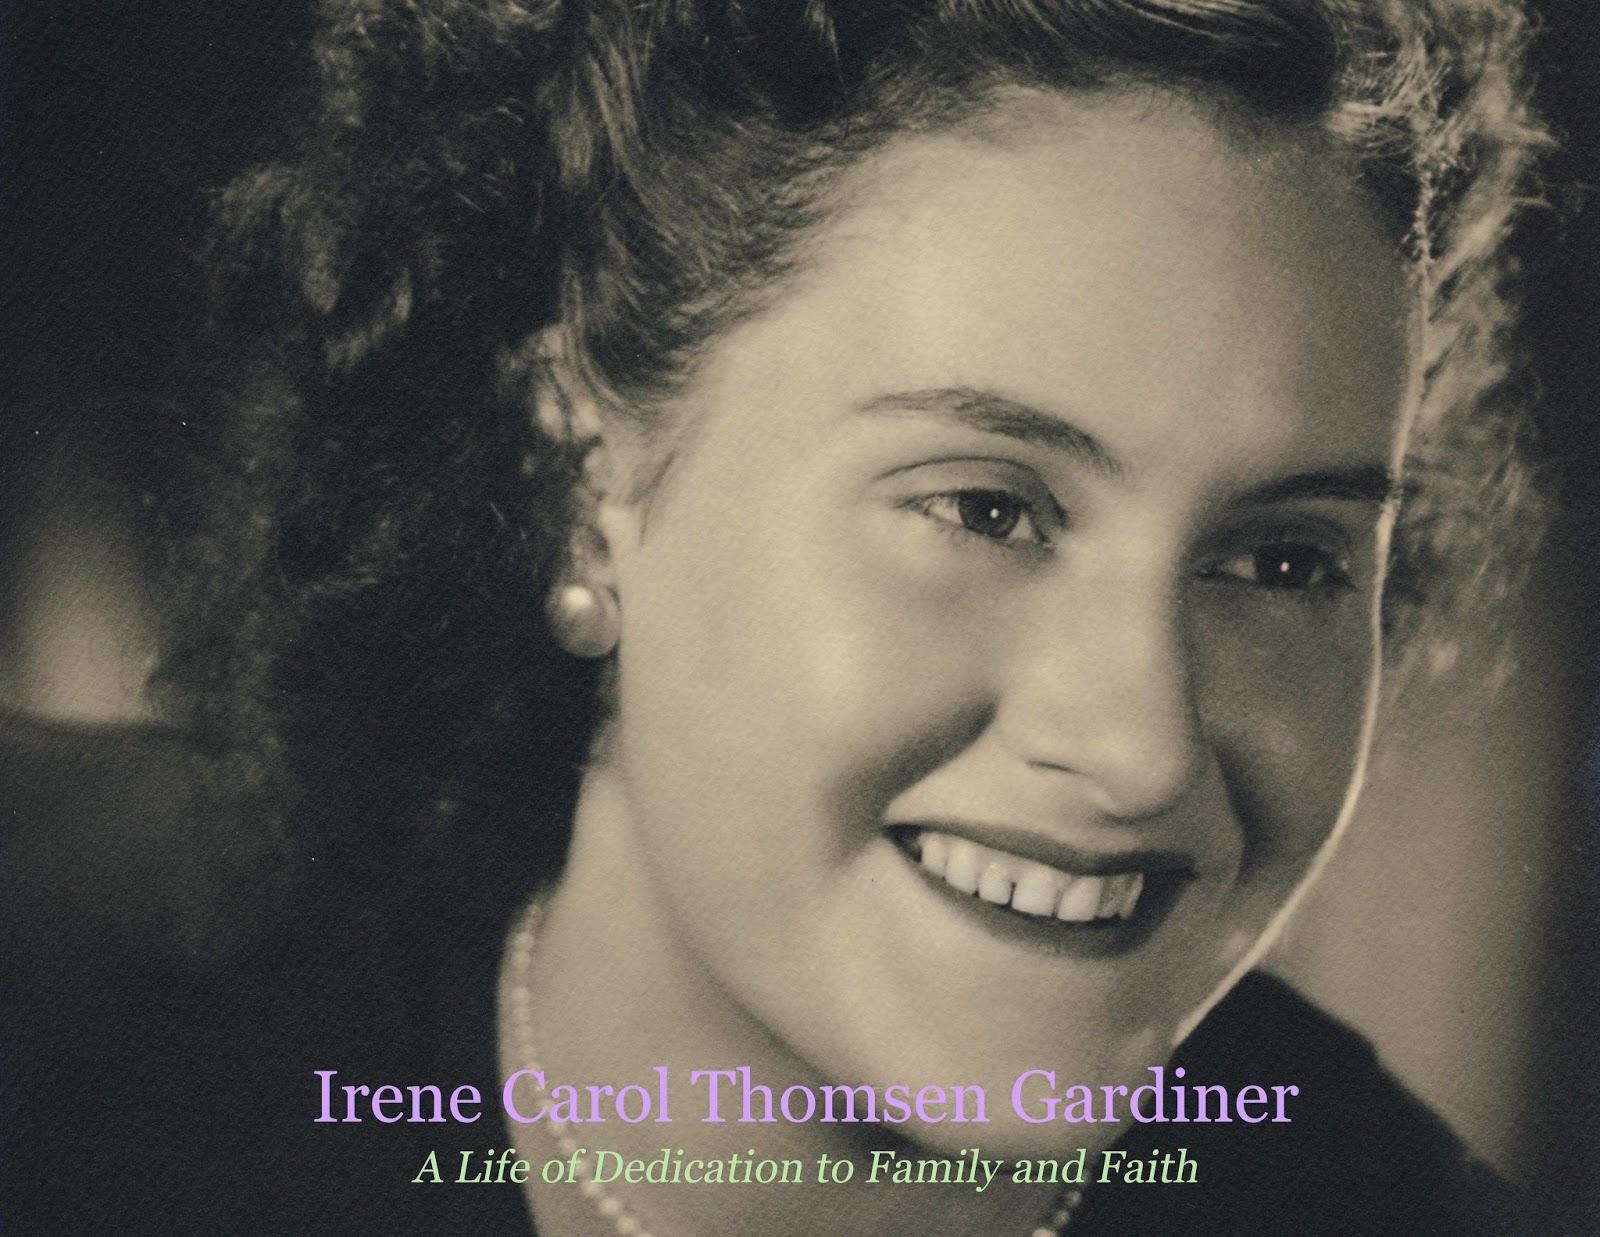 http://gatheringgardiners.blogspot.com/2014/11/irene-carol-thomsen-gardiner-life-of.html